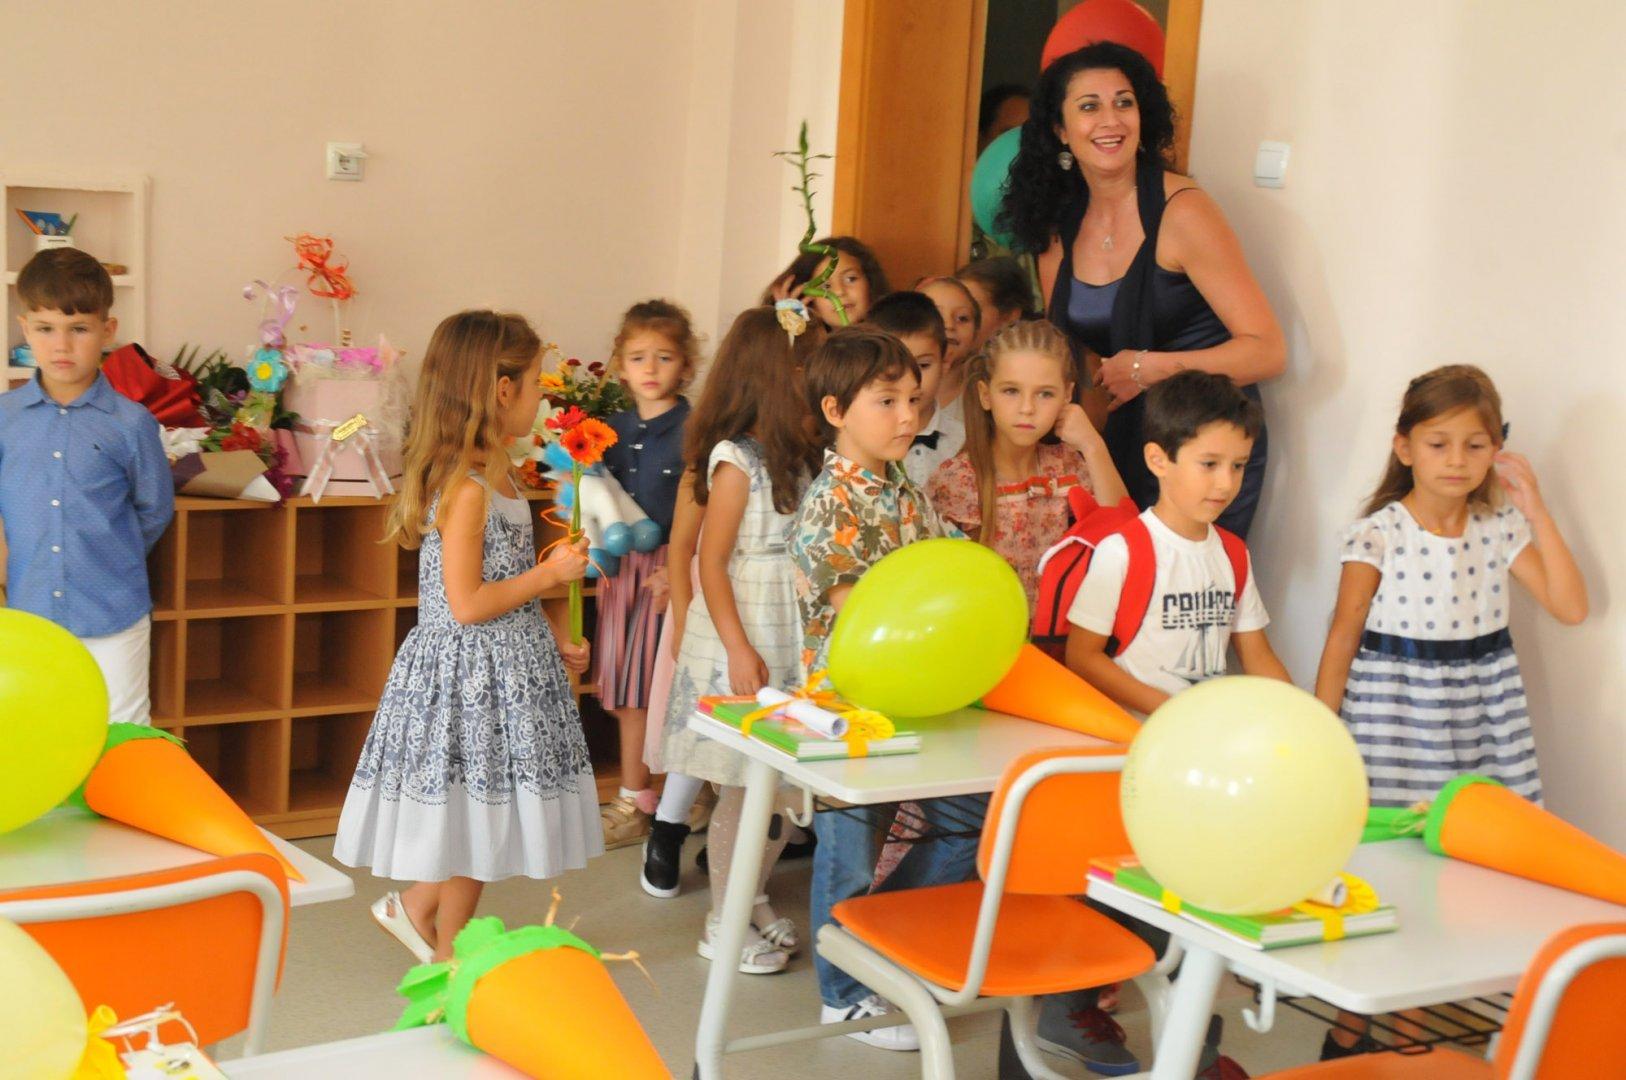 Учениците ще се обучават в обзаведена класна стая. Снимка Архив Черноморие-бг